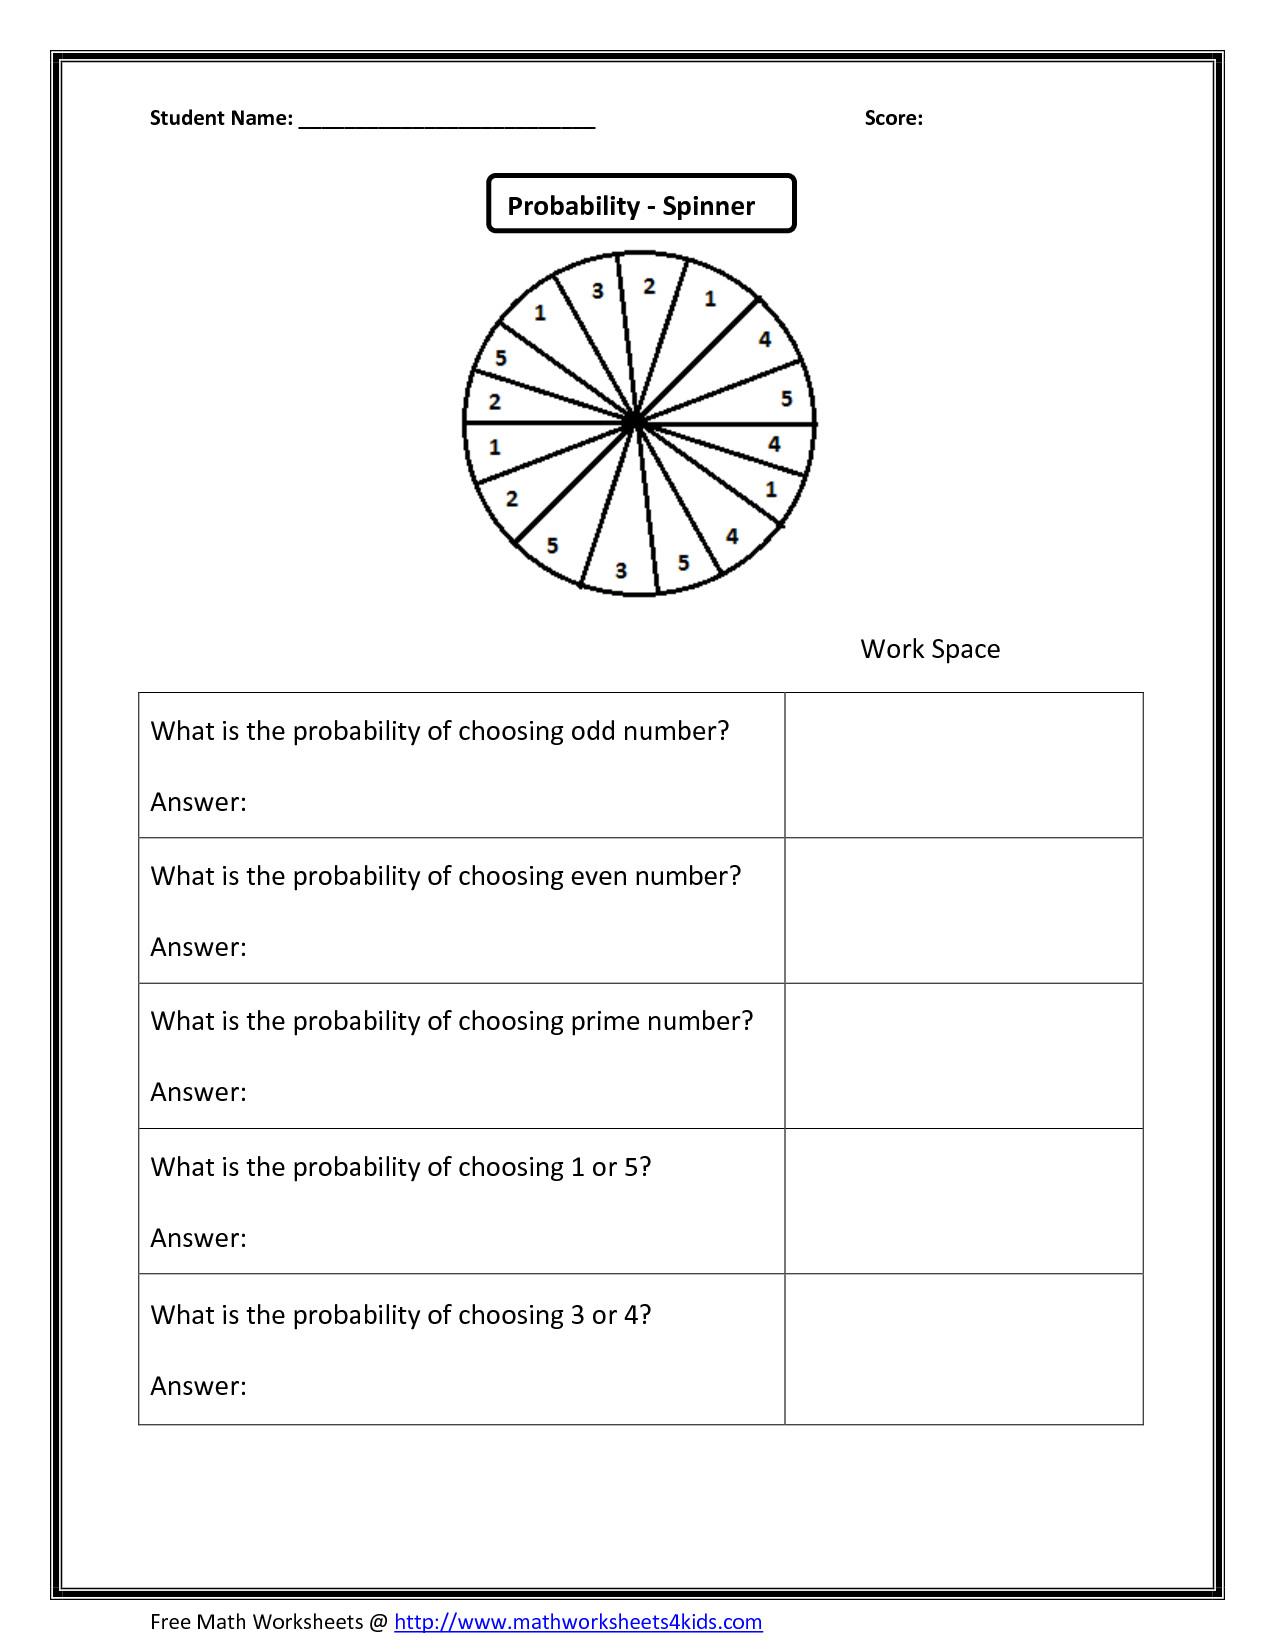 8th Grade Math Probability Worksheets Printable Worksheet